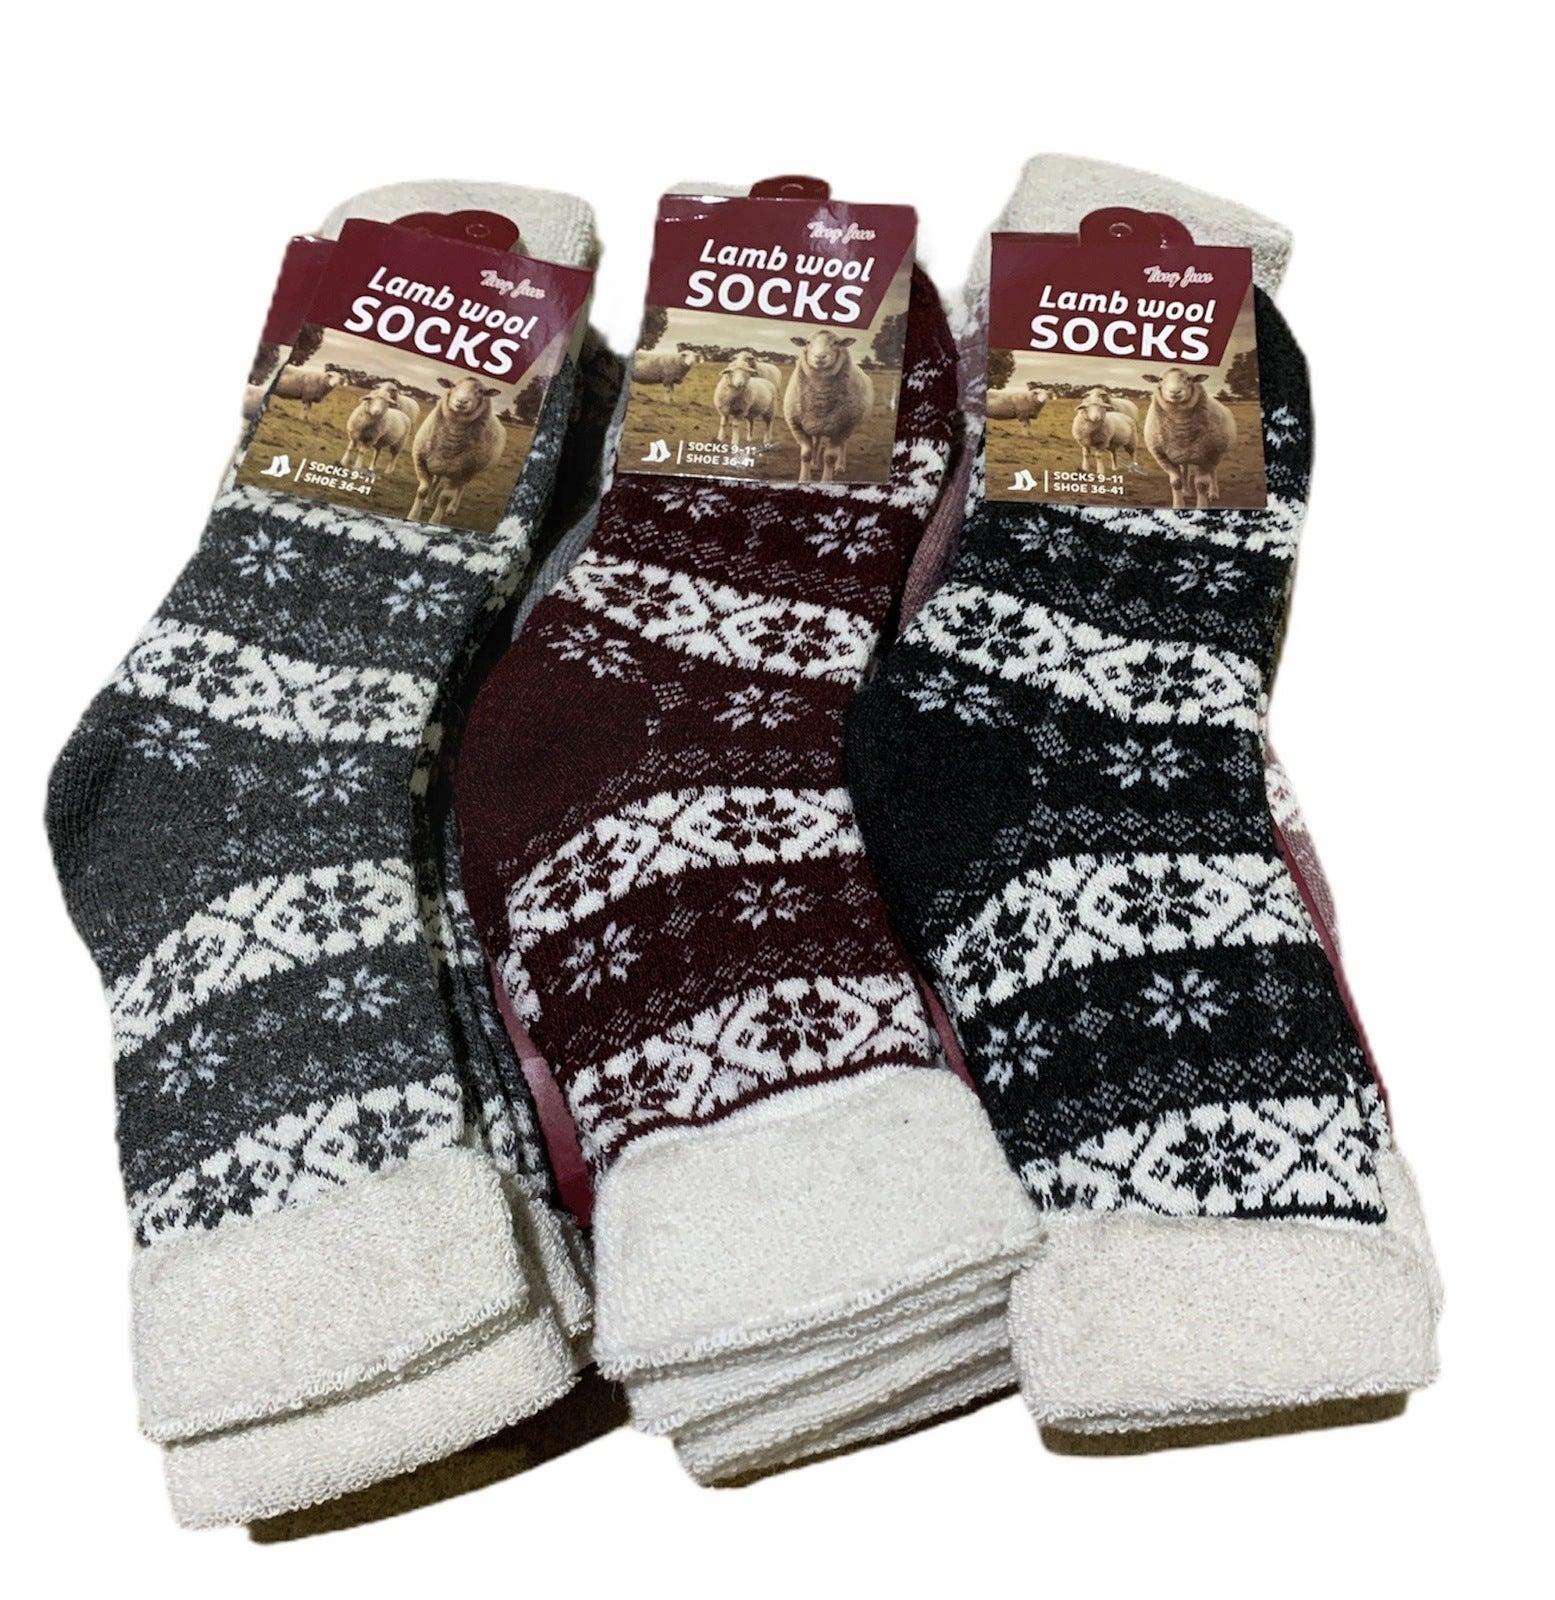 6 Pairs Women's Lambs Wool Socks Extra Warm Winter Thermal Soft